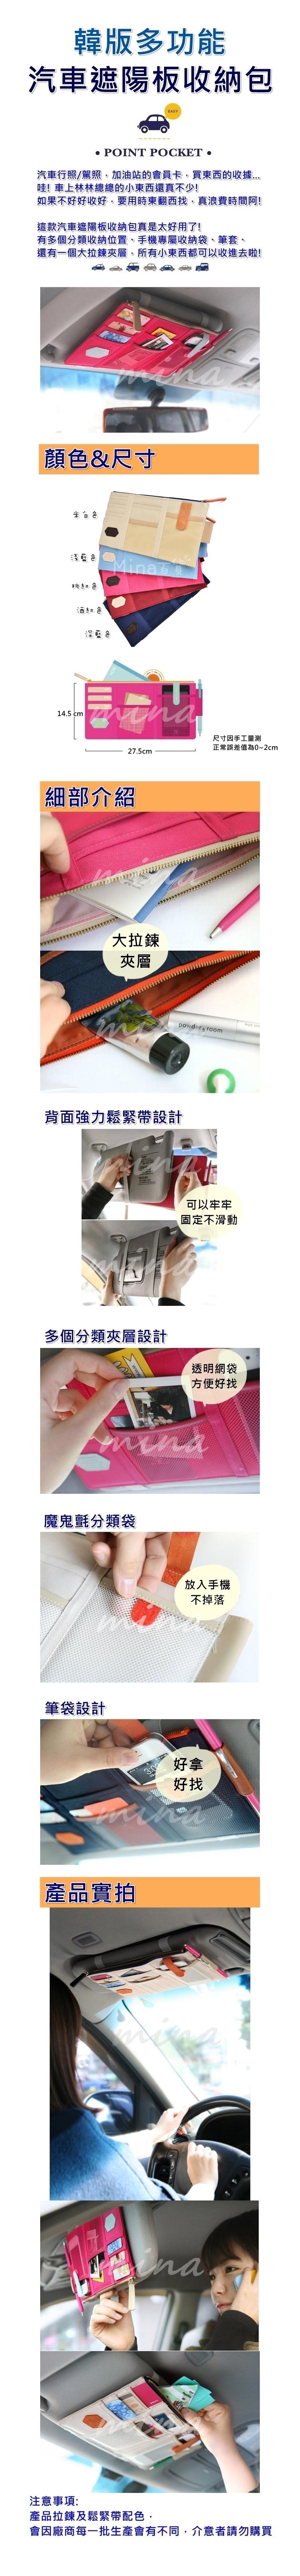 B00039 汽車遮陽板收納包 長圖(有mina)